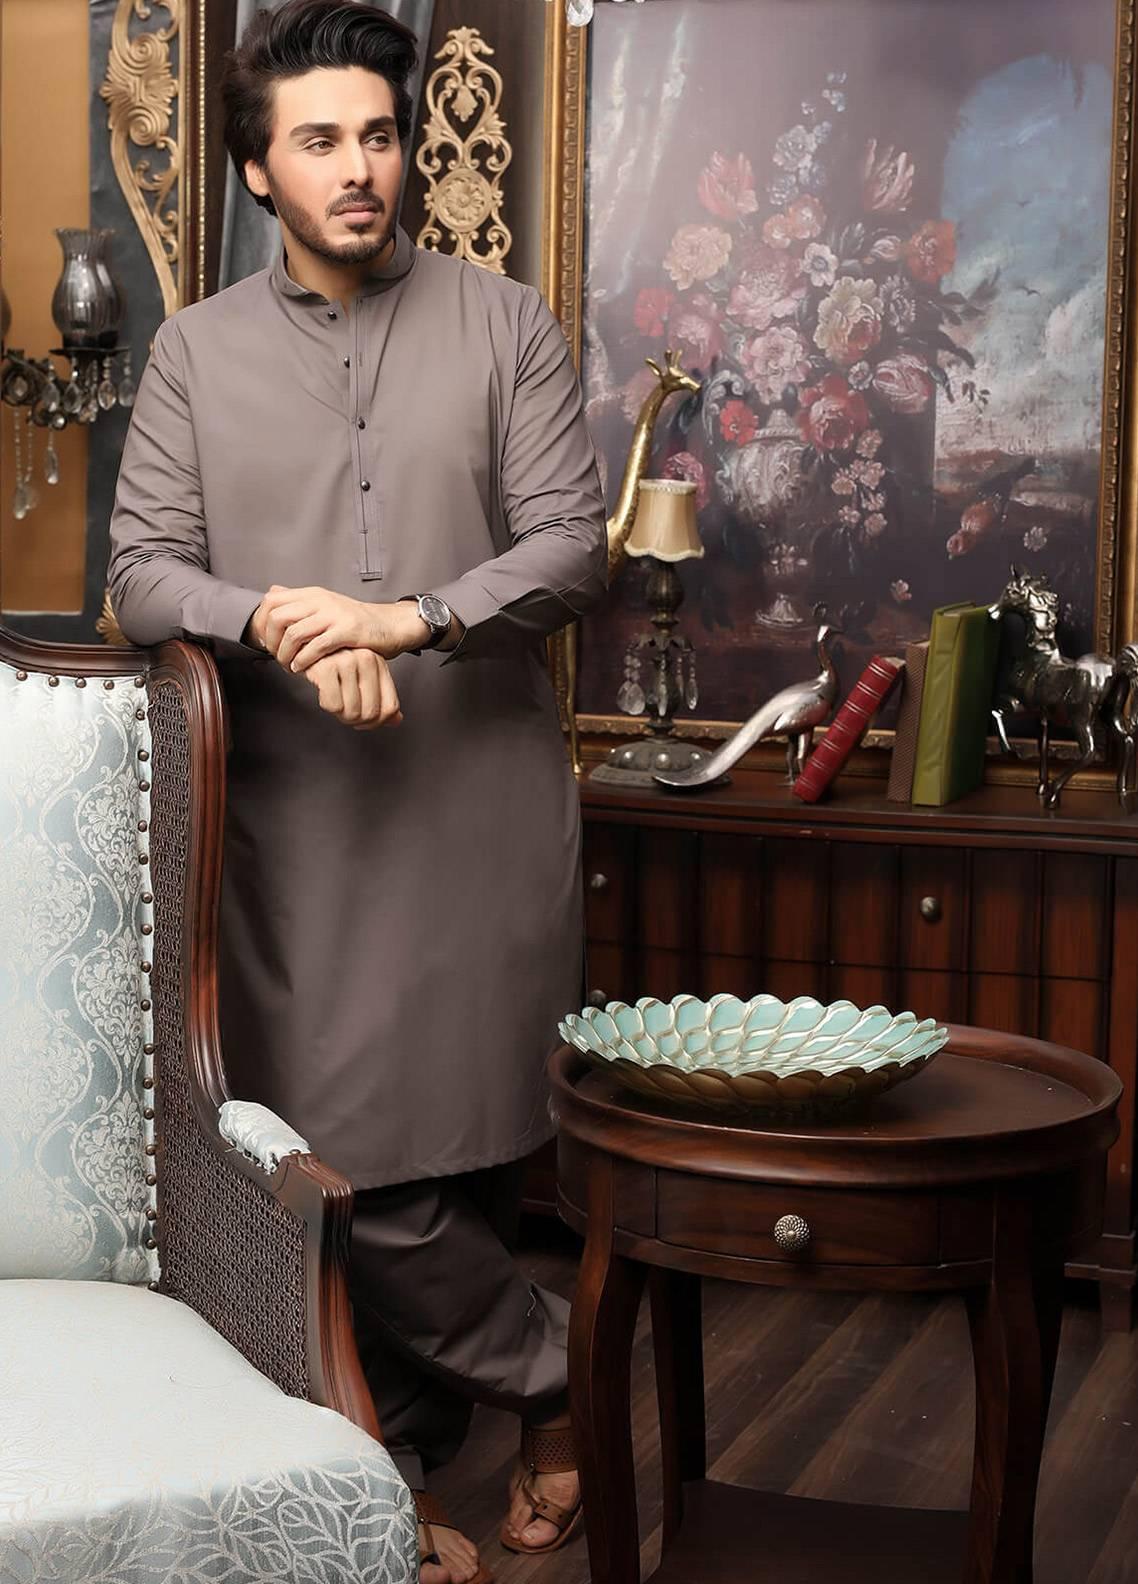 65324a7ca2 Safeer by Edenrobe EMUC18-OBSESSION Cotton Unstitched Men's Kameez Shalwar  Fabric. Online only